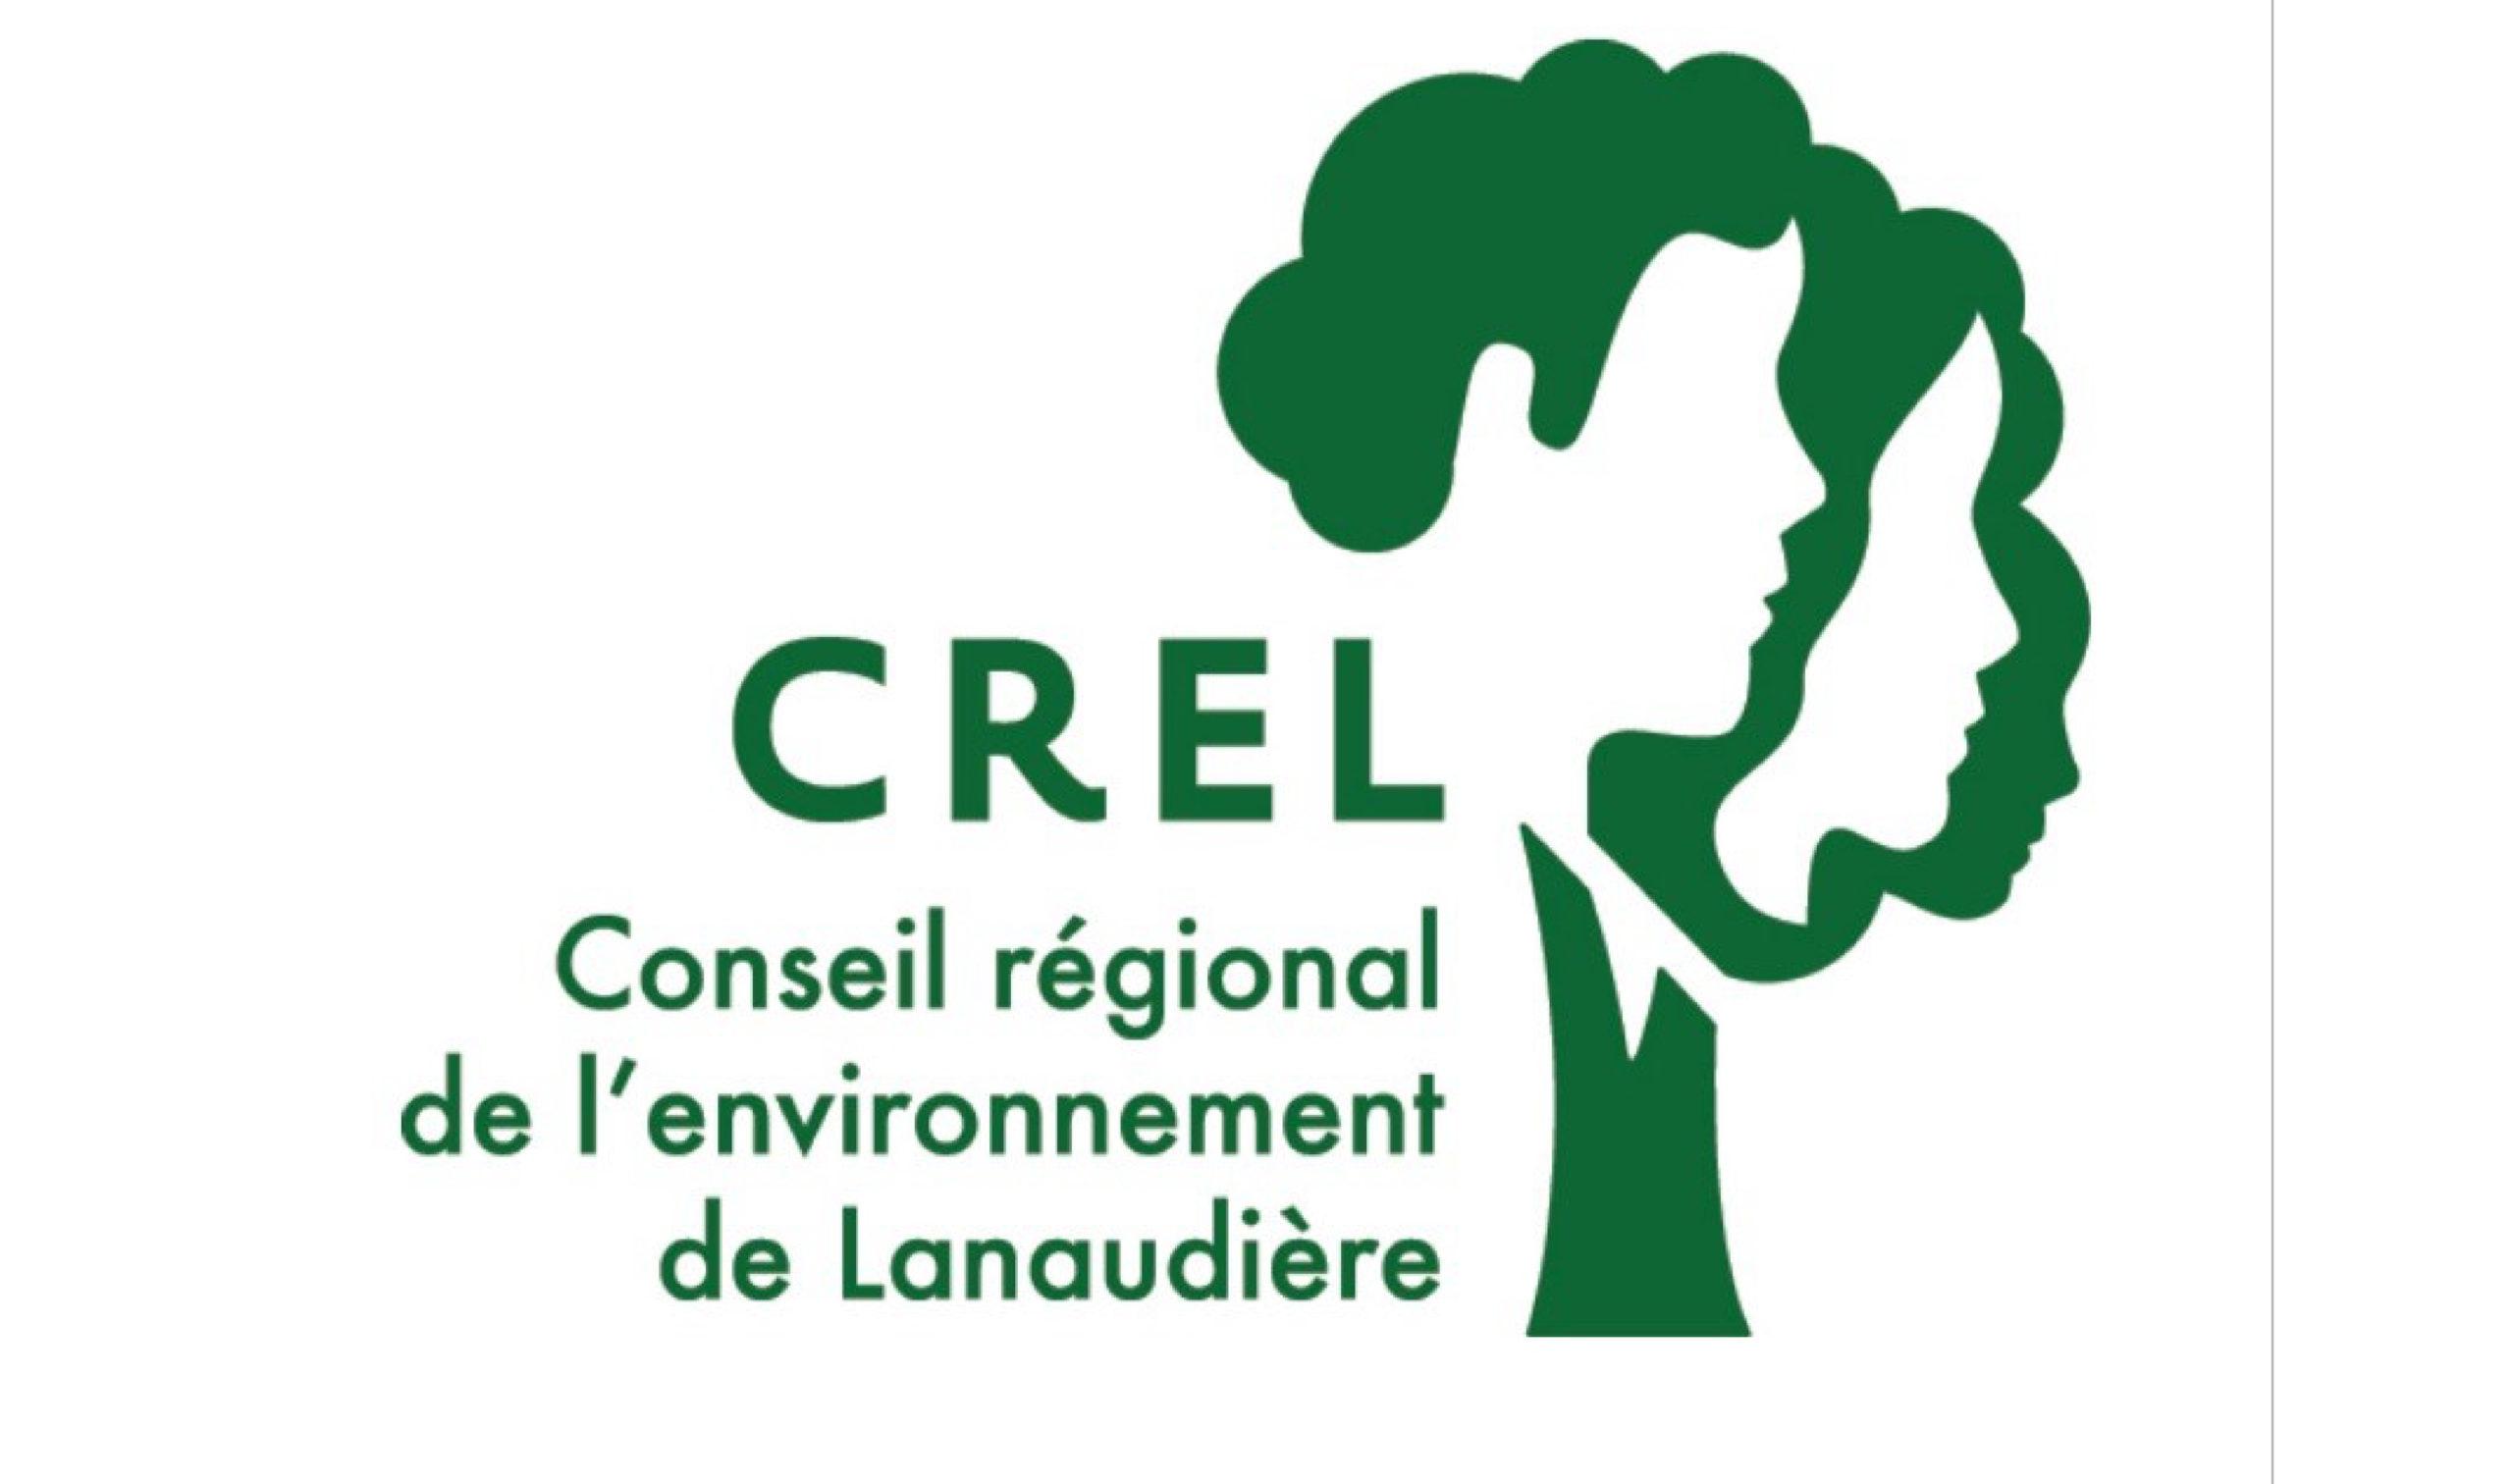 14-Lanaudiere-conseilregionaldelenvironnement-